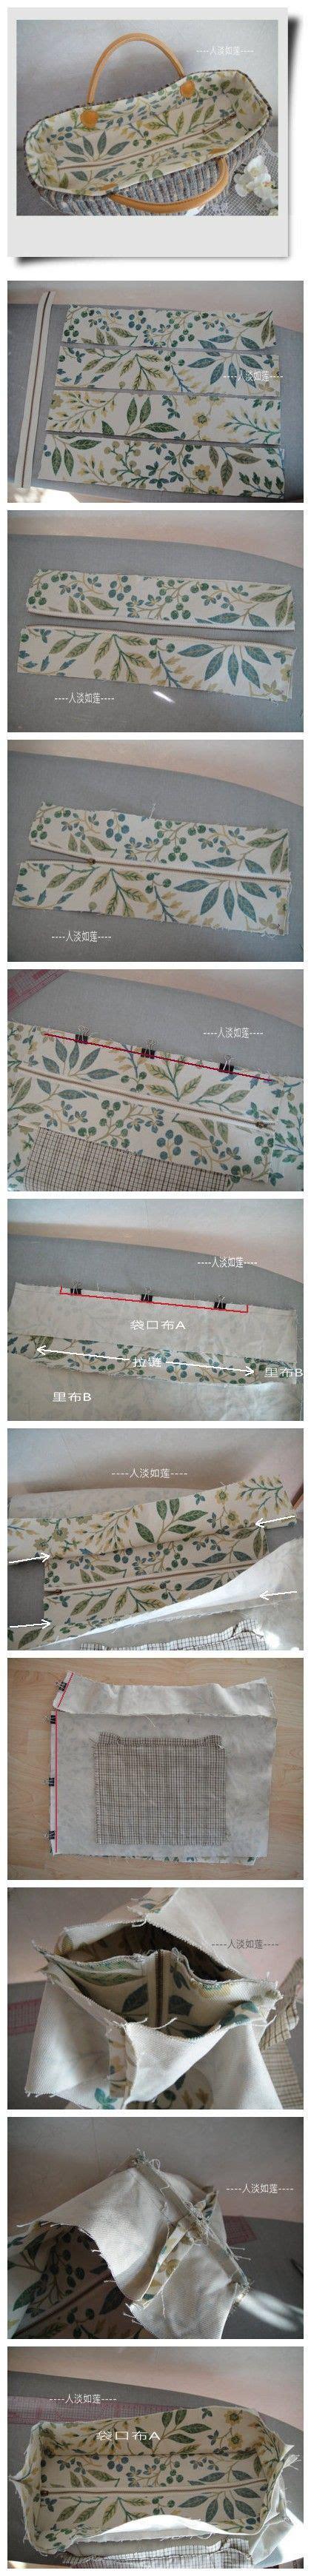 tote bag pattern with recessed zipper recessed zipper tutorial duitang bag ideas